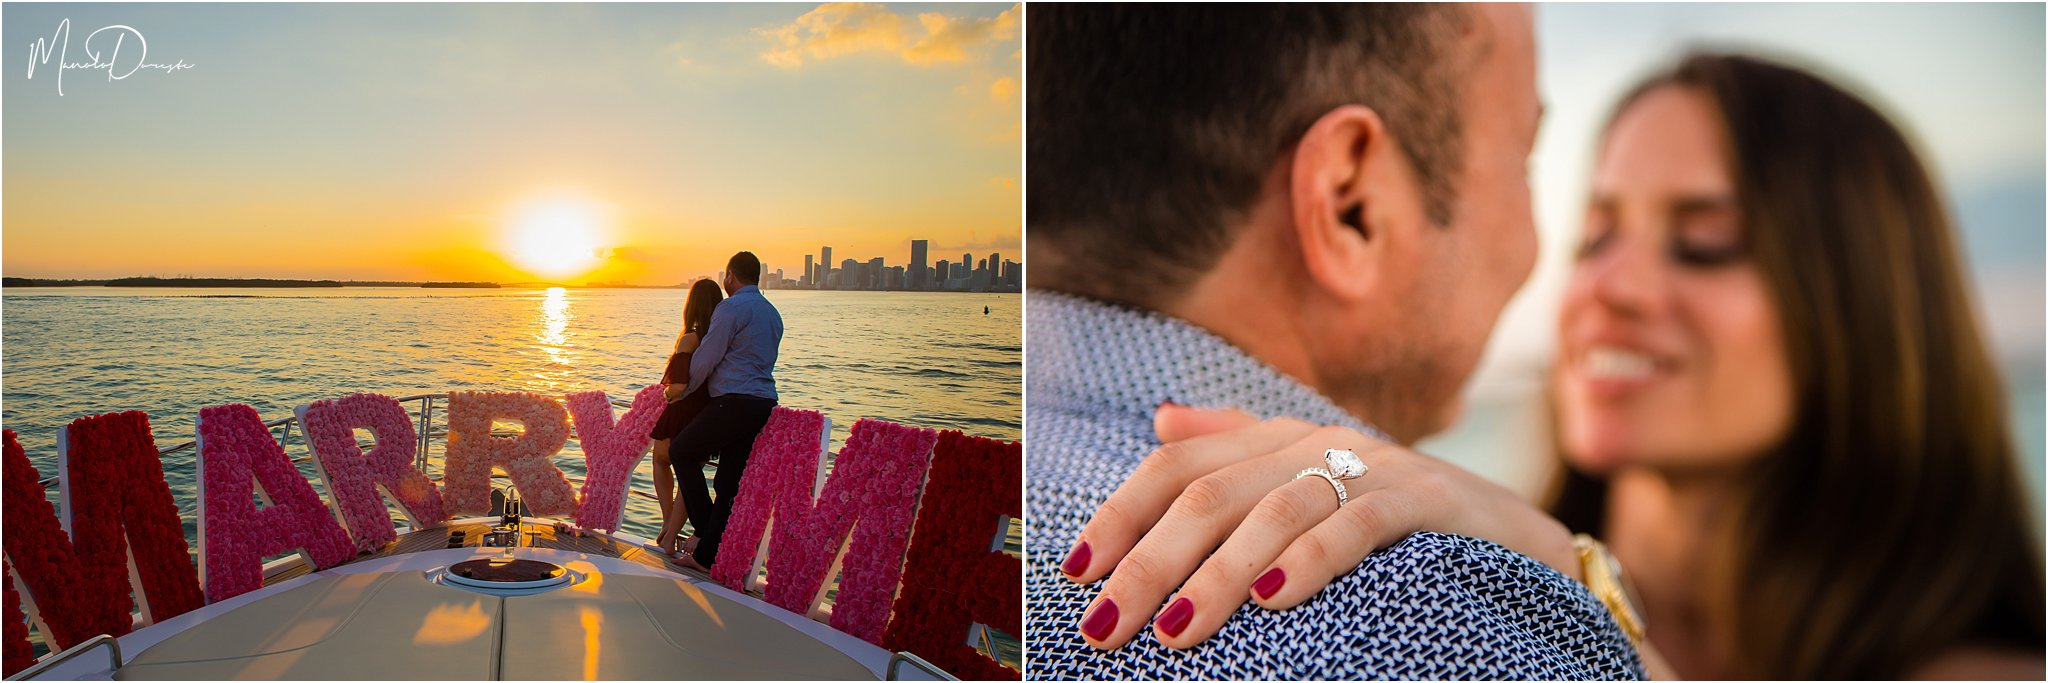 0013_ManoloDoreste_InFocusStudios_Wedding_Family_Photography_Miami_MiamiPhotographer.jpg